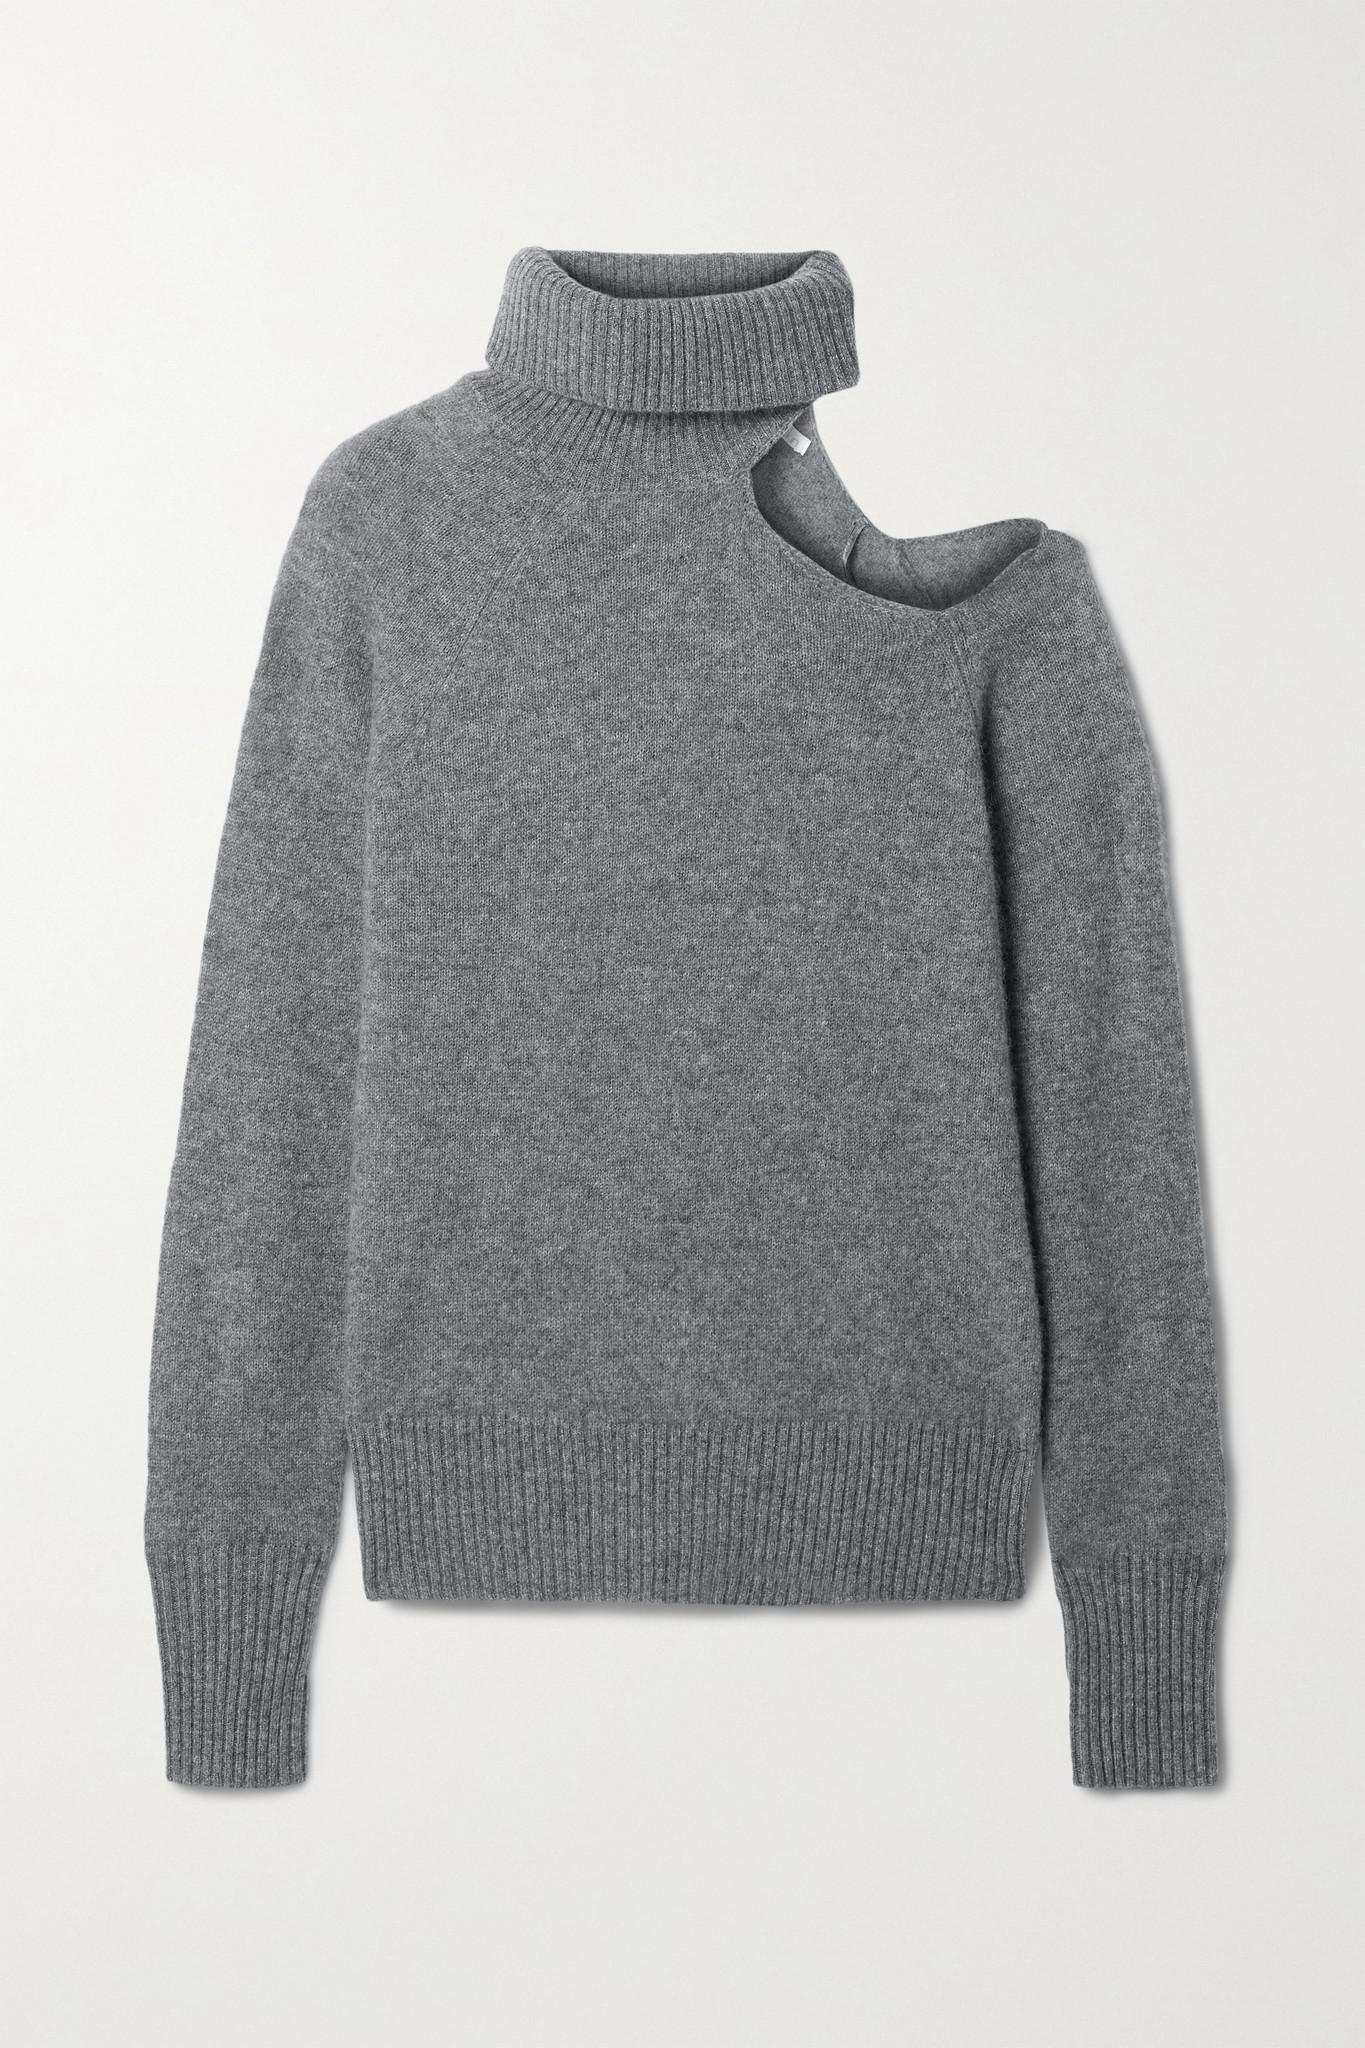 SKIN - Phoebe 挖剪羊绒高领毛衣 - 灰色 - small